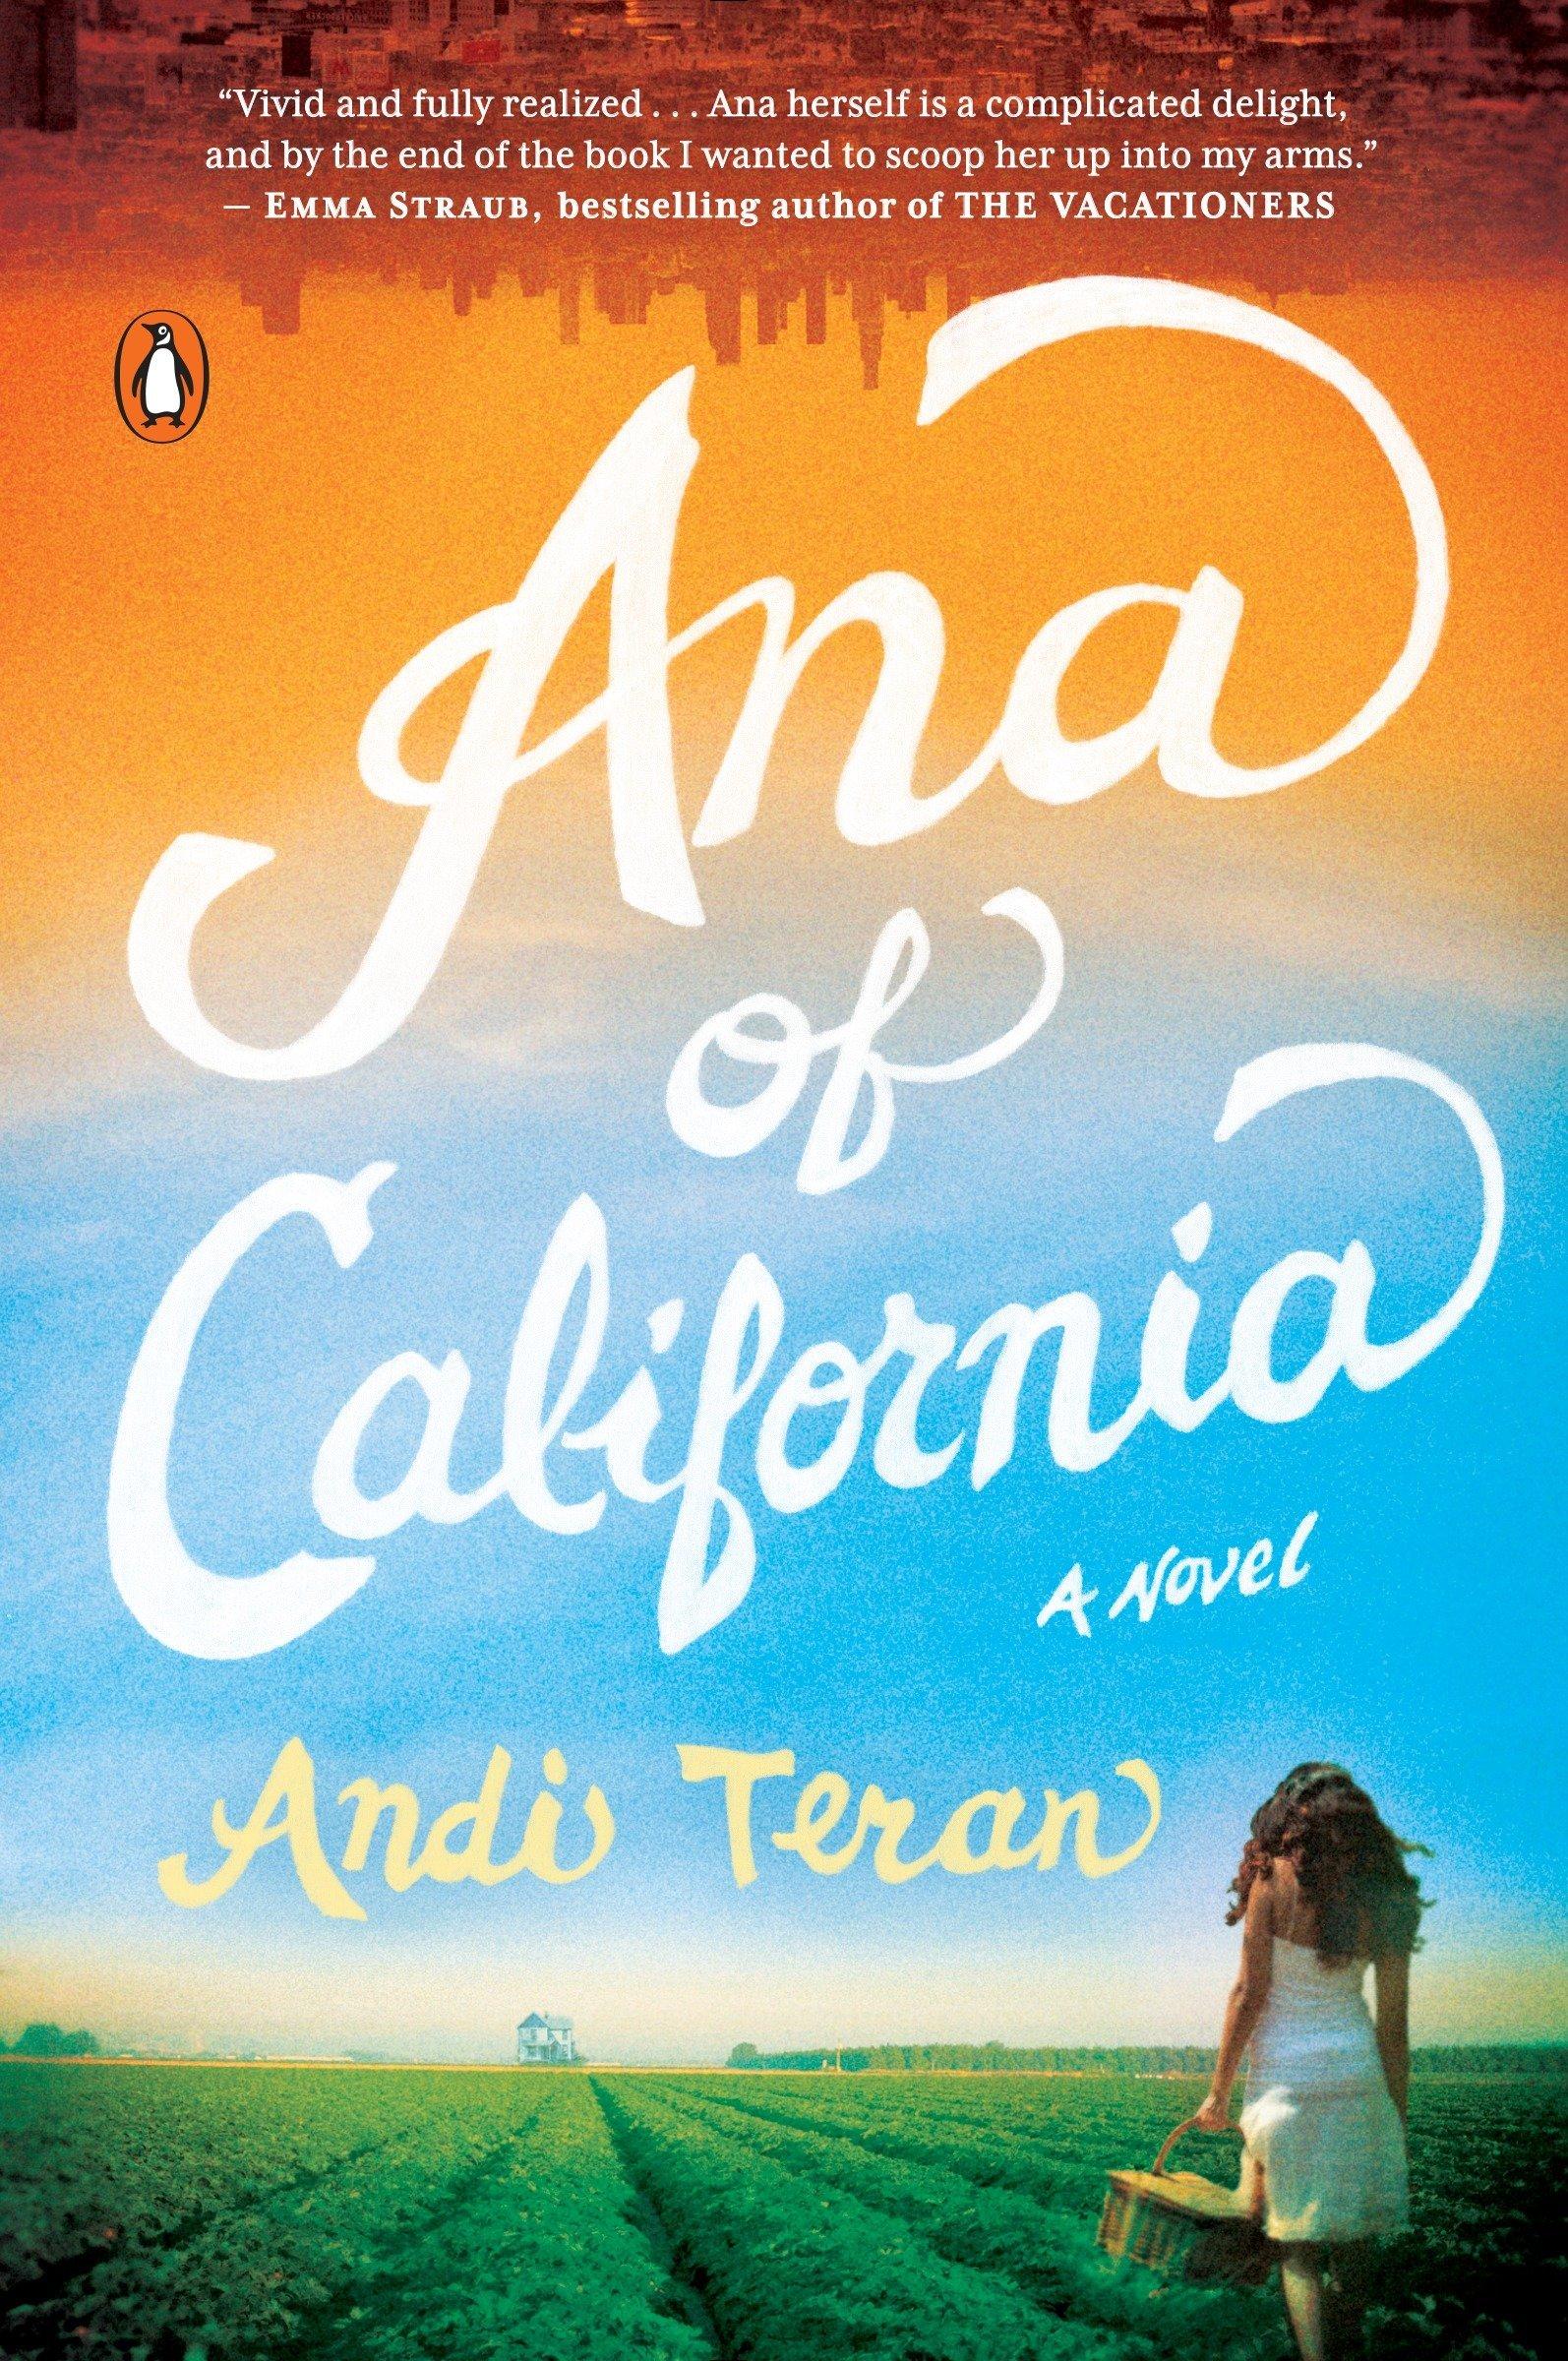 amazon ana of california a novel andi teran coming of age